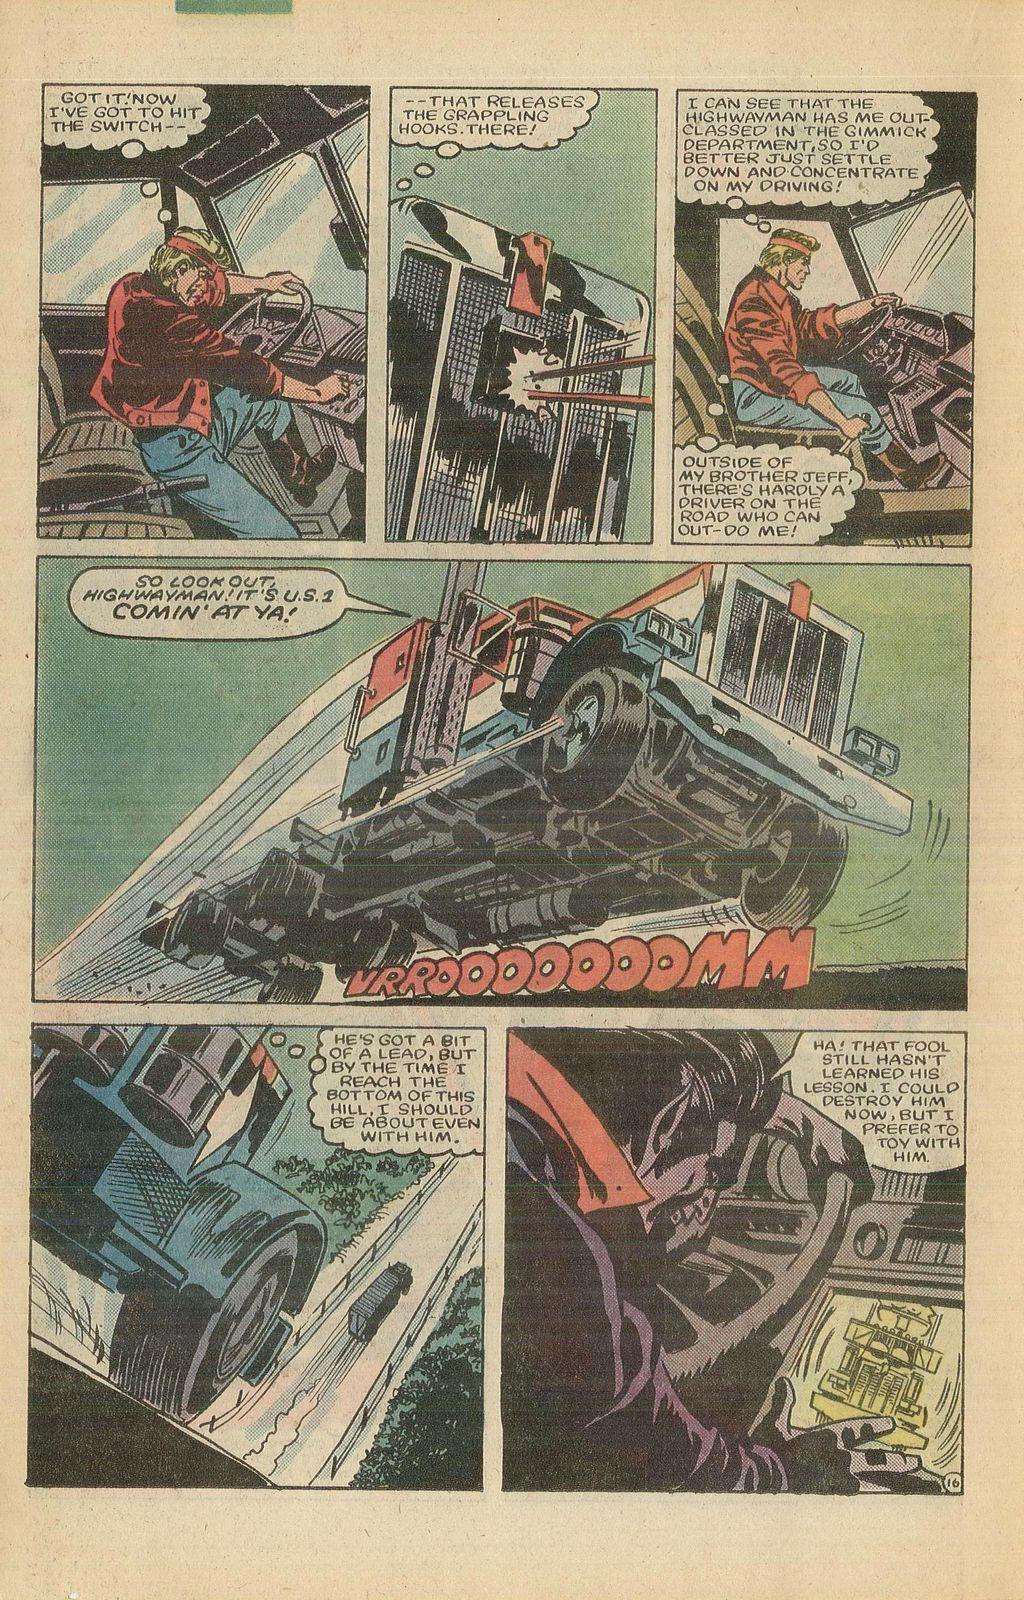 Read online U.S. 1 comic -  Issue #10 - 22